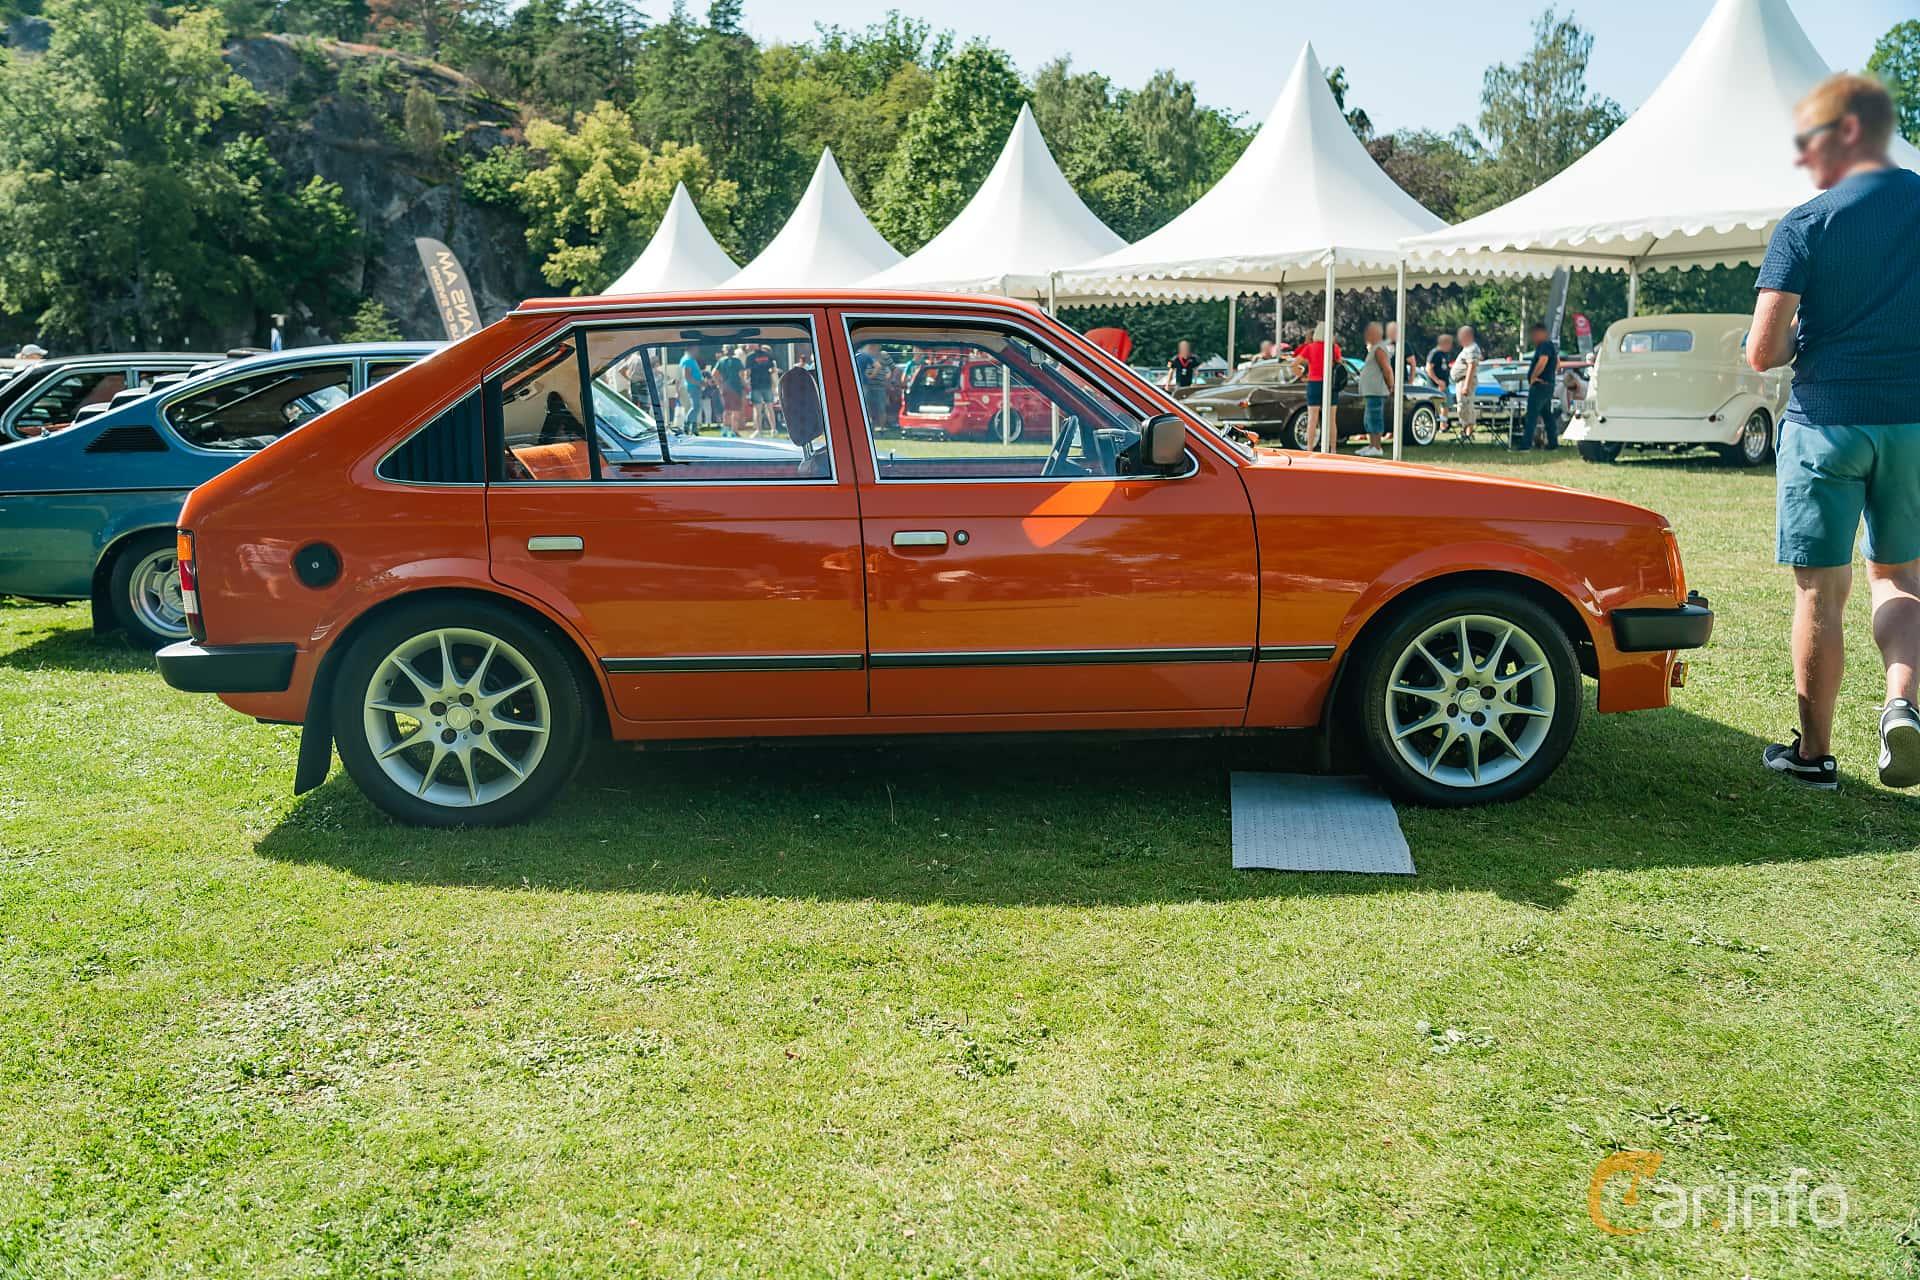 Opel Kadett 1200 S 5-door Hatchback 1.2 Manual, 60hp, 1980 at Ronneby Nostalgia Festival 2019